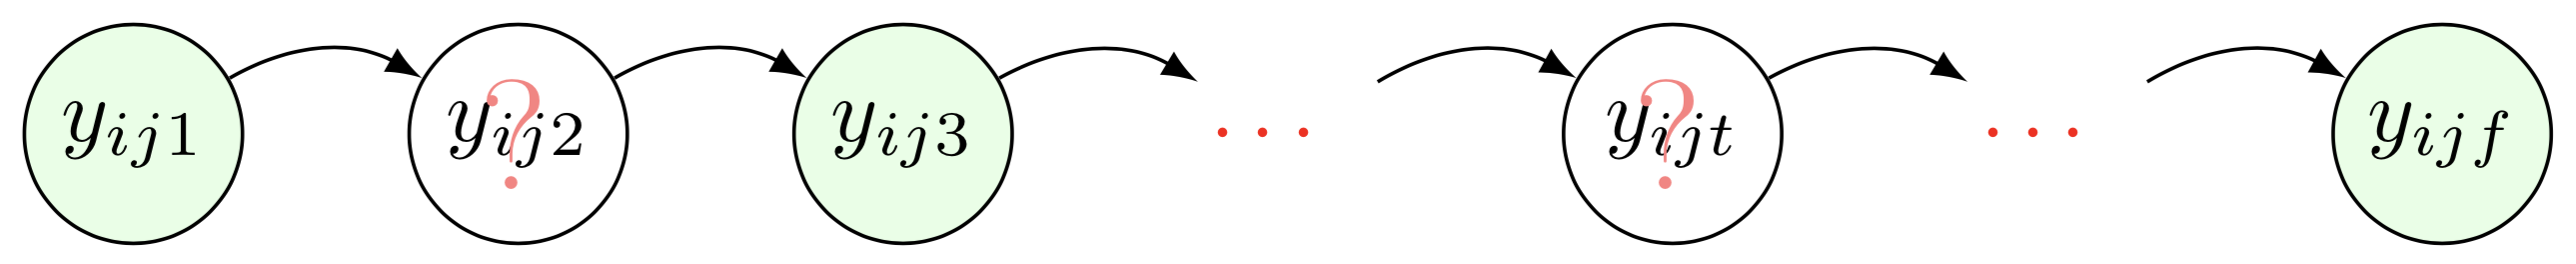 tensor_time_series